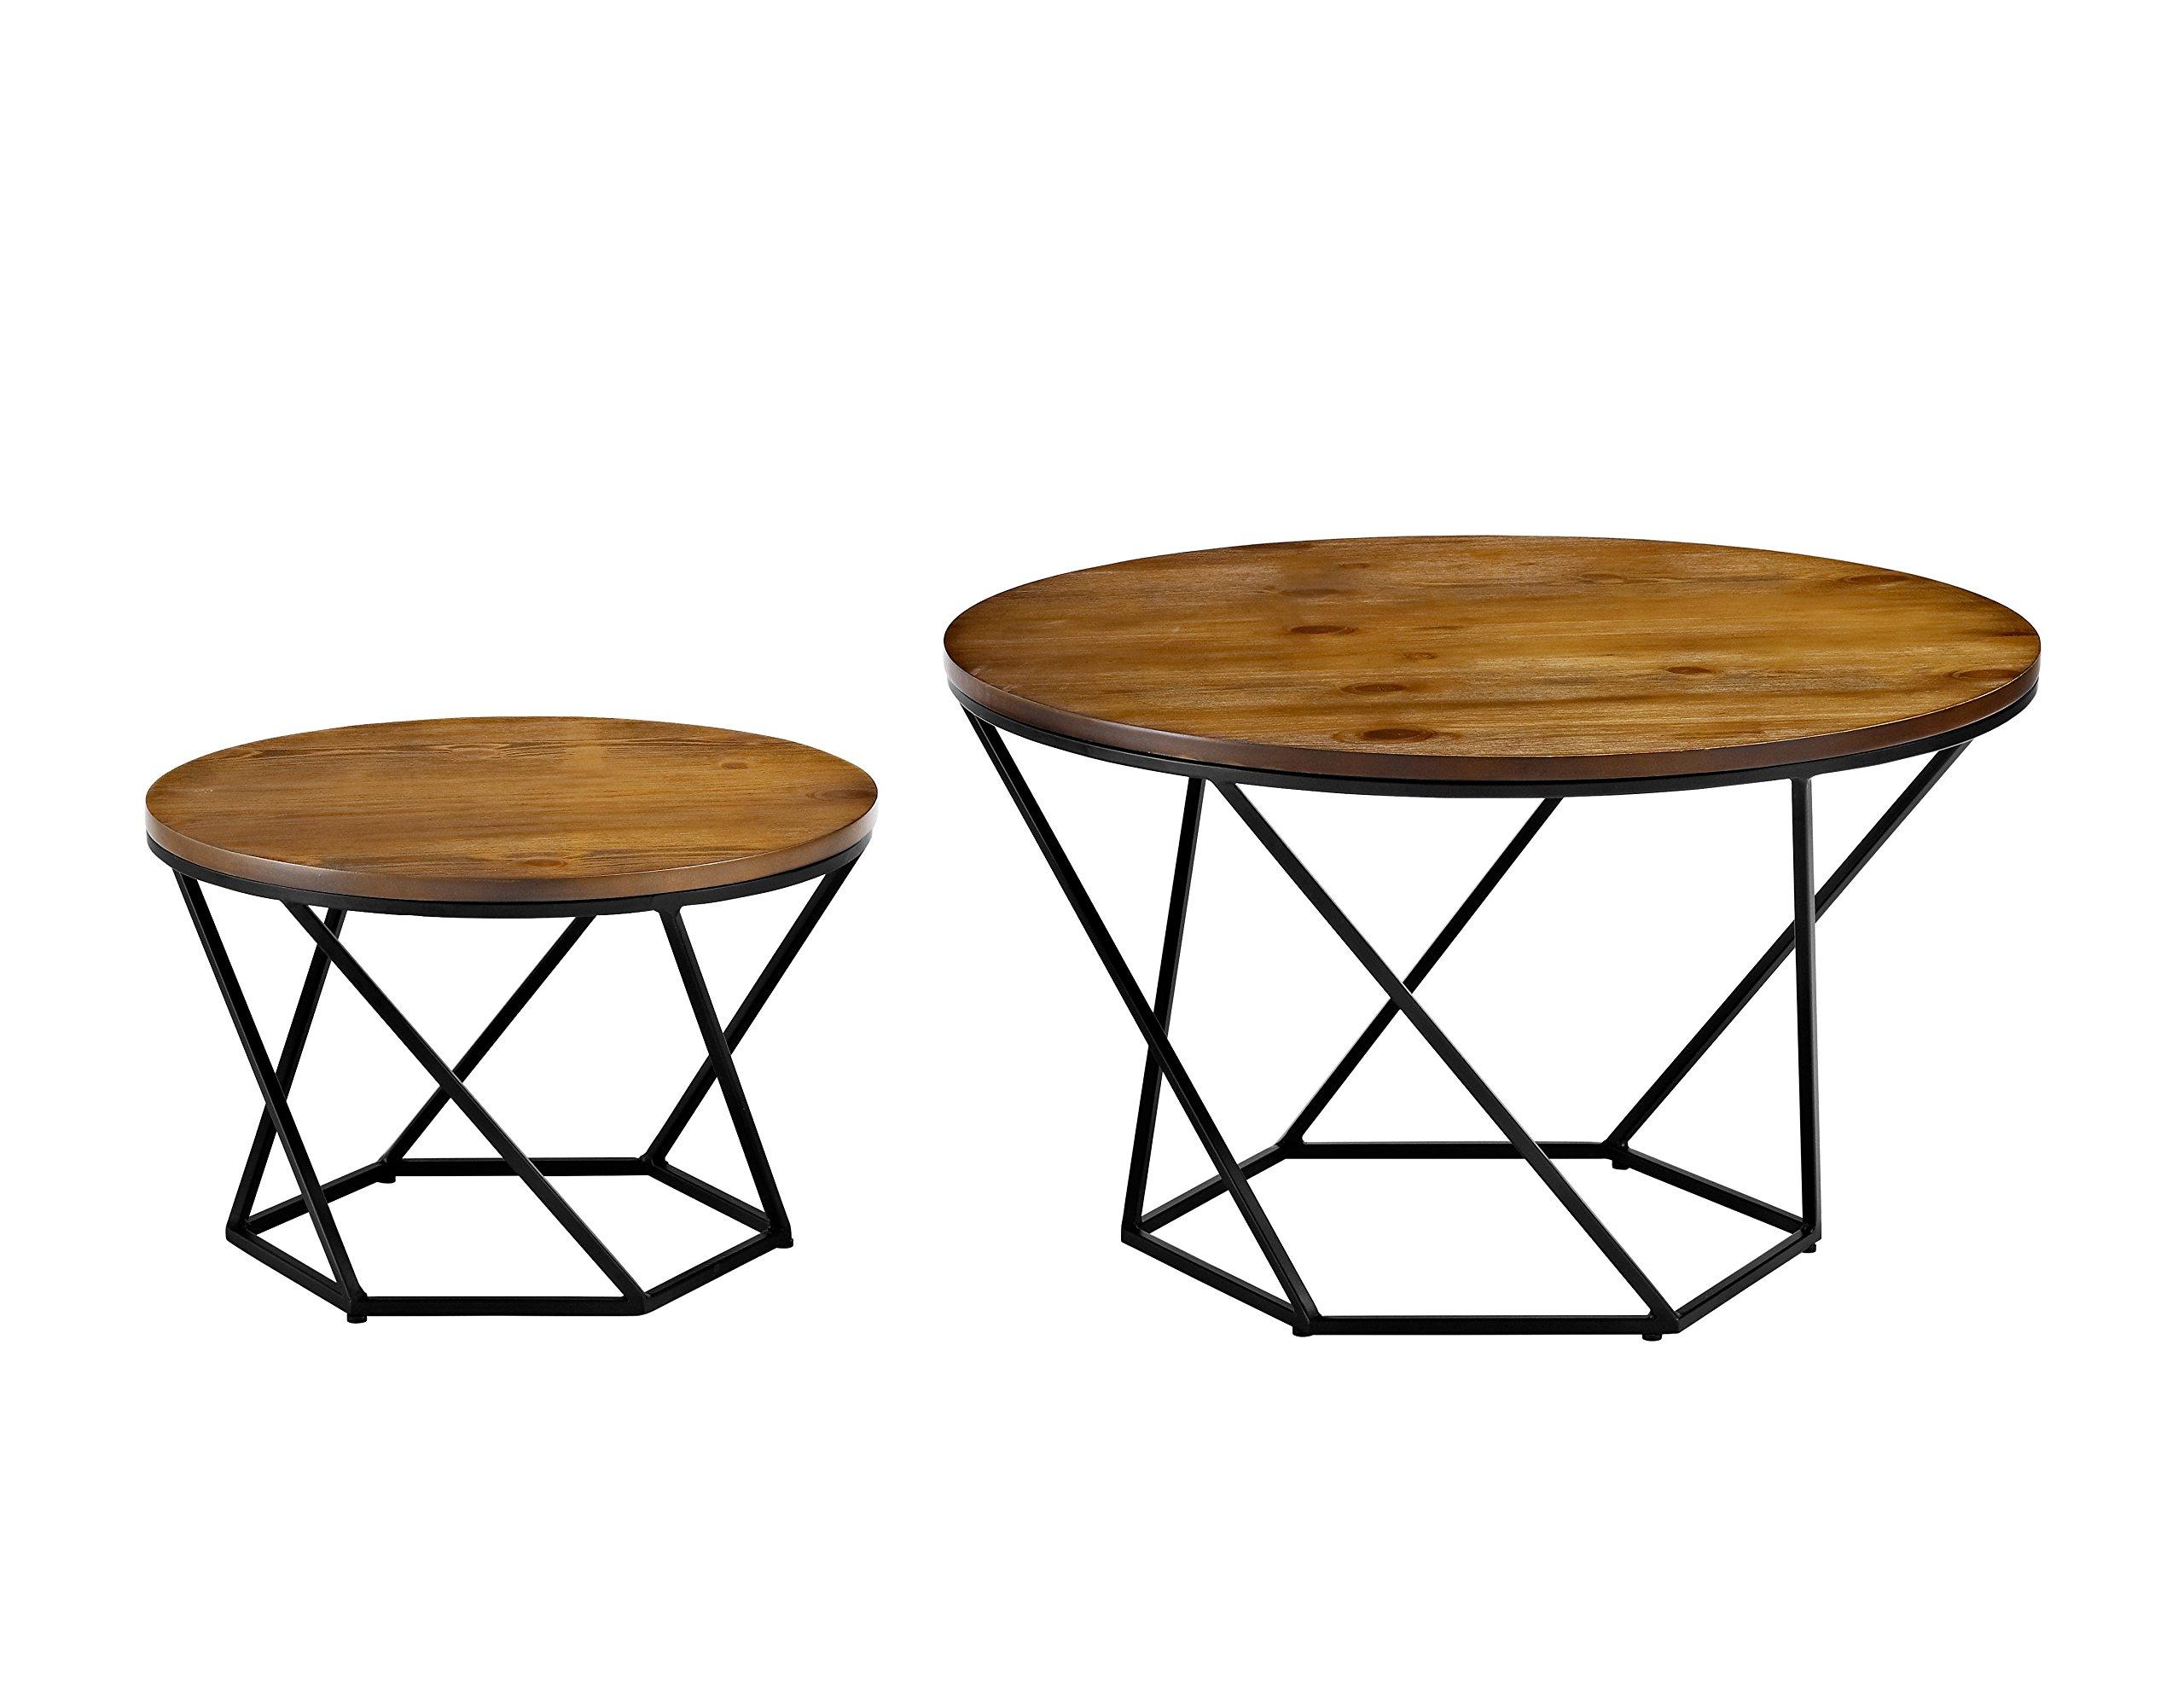 WE Furniture Geometric Wood Nesting Coffee Tables - Oak/Black by WE Furniture (Image #2)